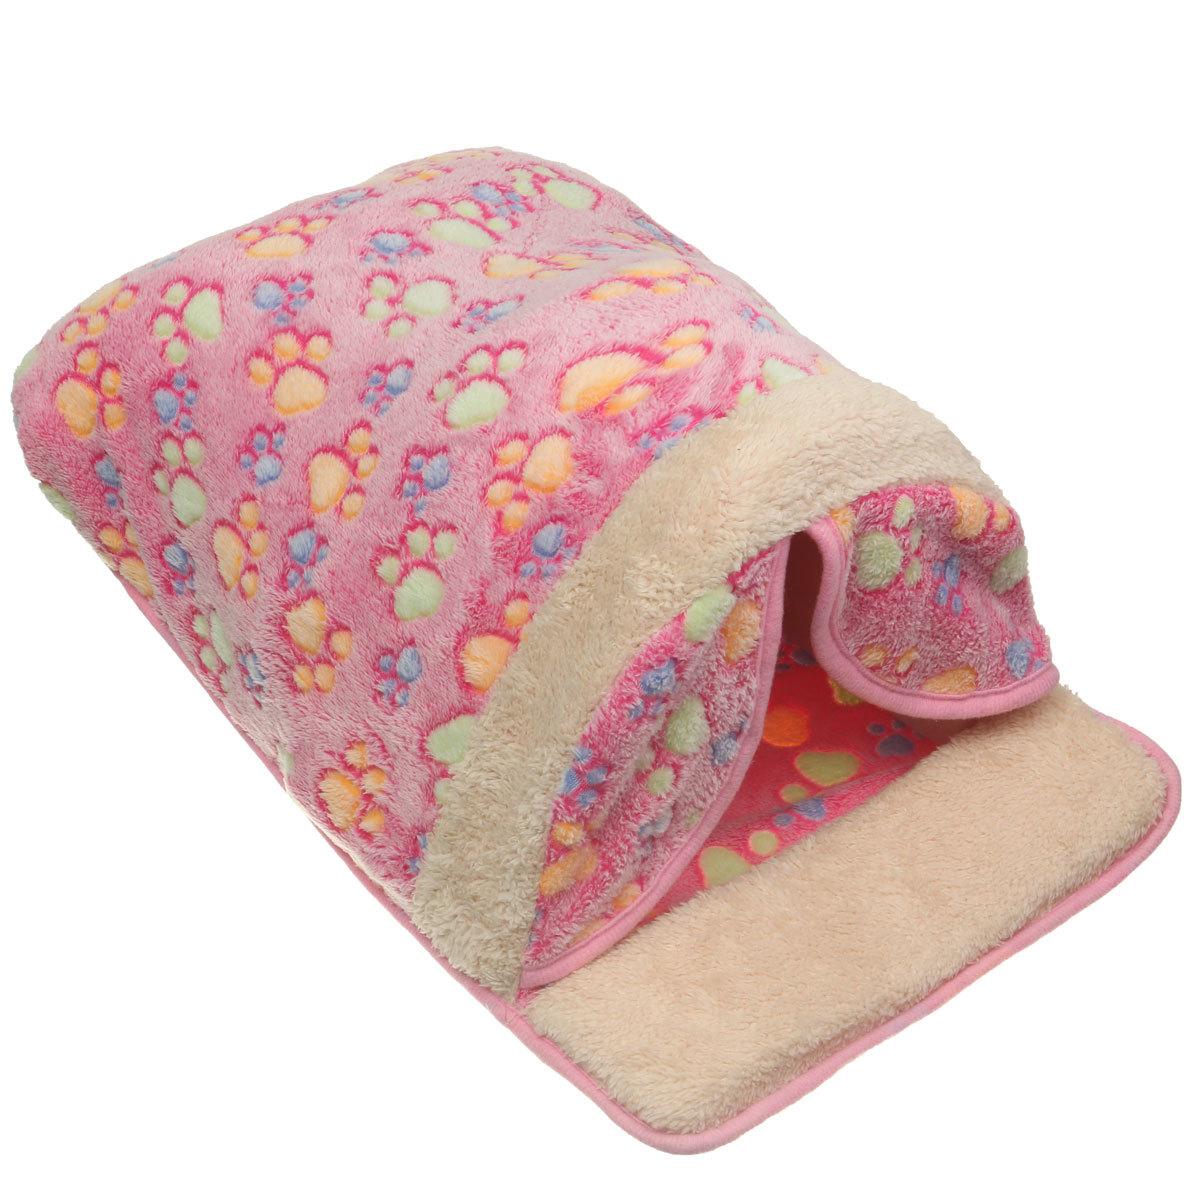 ... Baru kucing hangat lembut tempat tidur anjing/hewan peliharaan Kitty anak Sofa tempat tidur nyaman ...